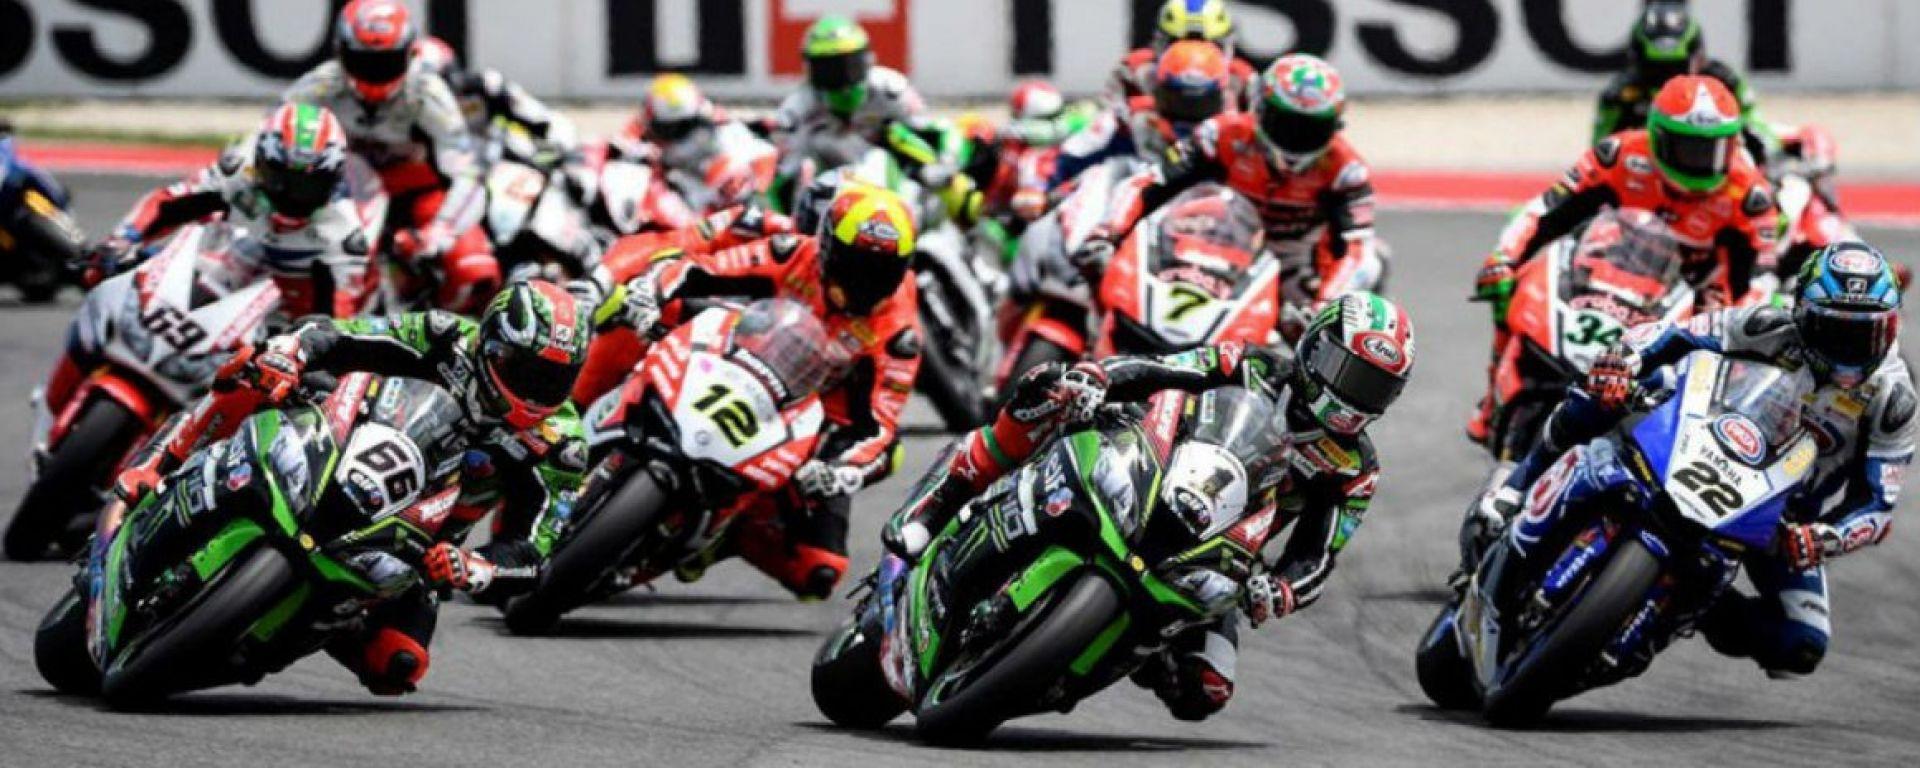 Superbike 2018: classifica piloti e team